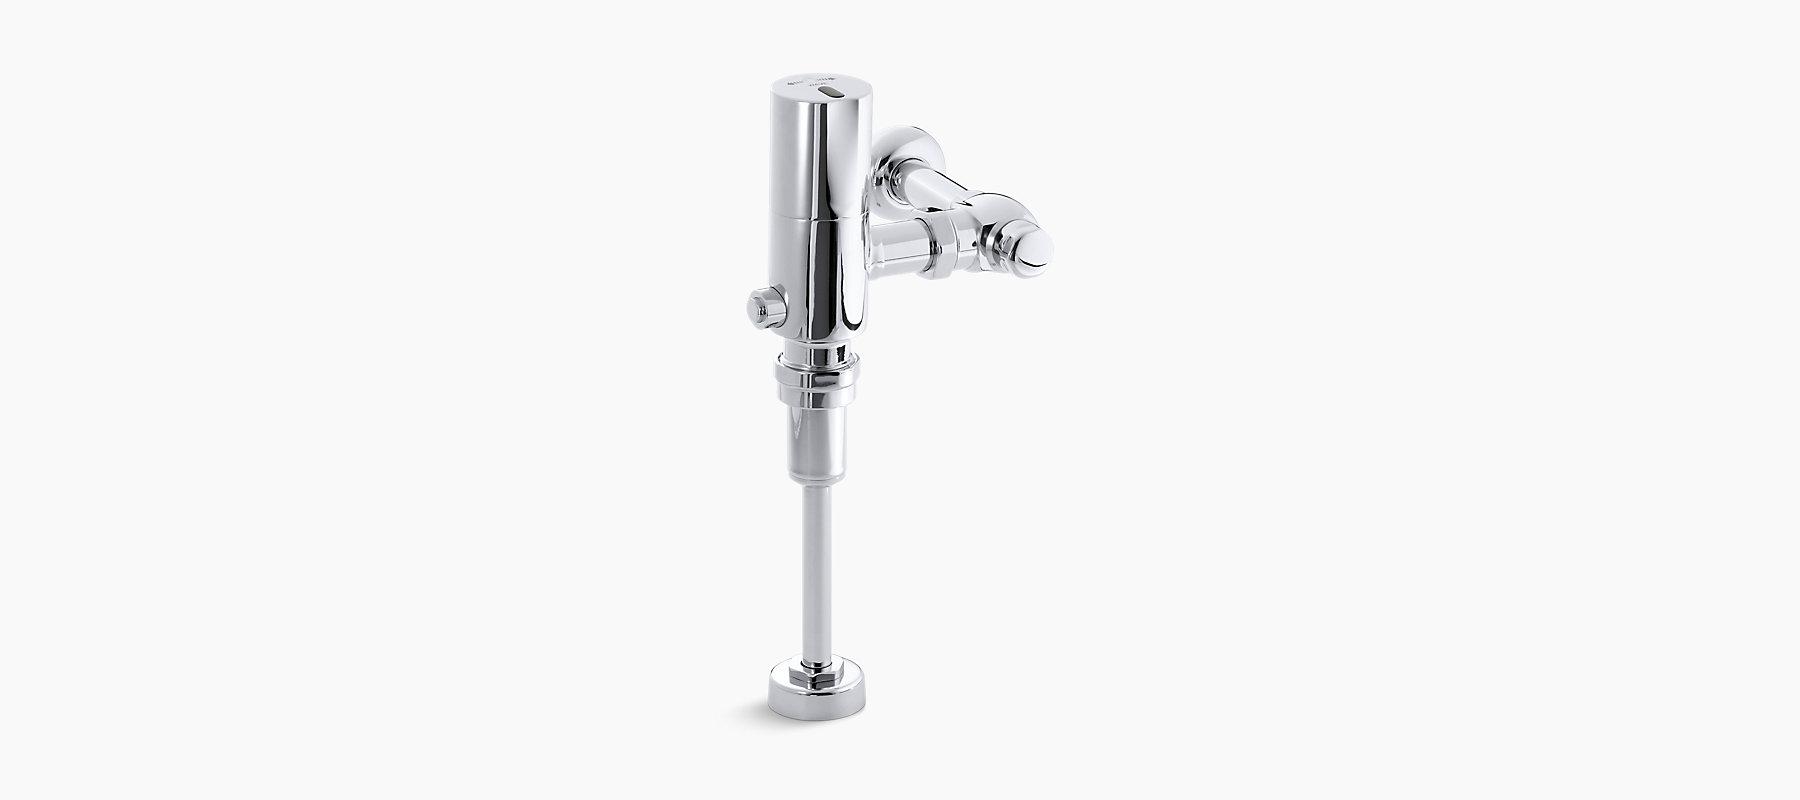 K-10676 | Touchless washdown urinal 1.0 gpf/3.8 lpf flushometer ...